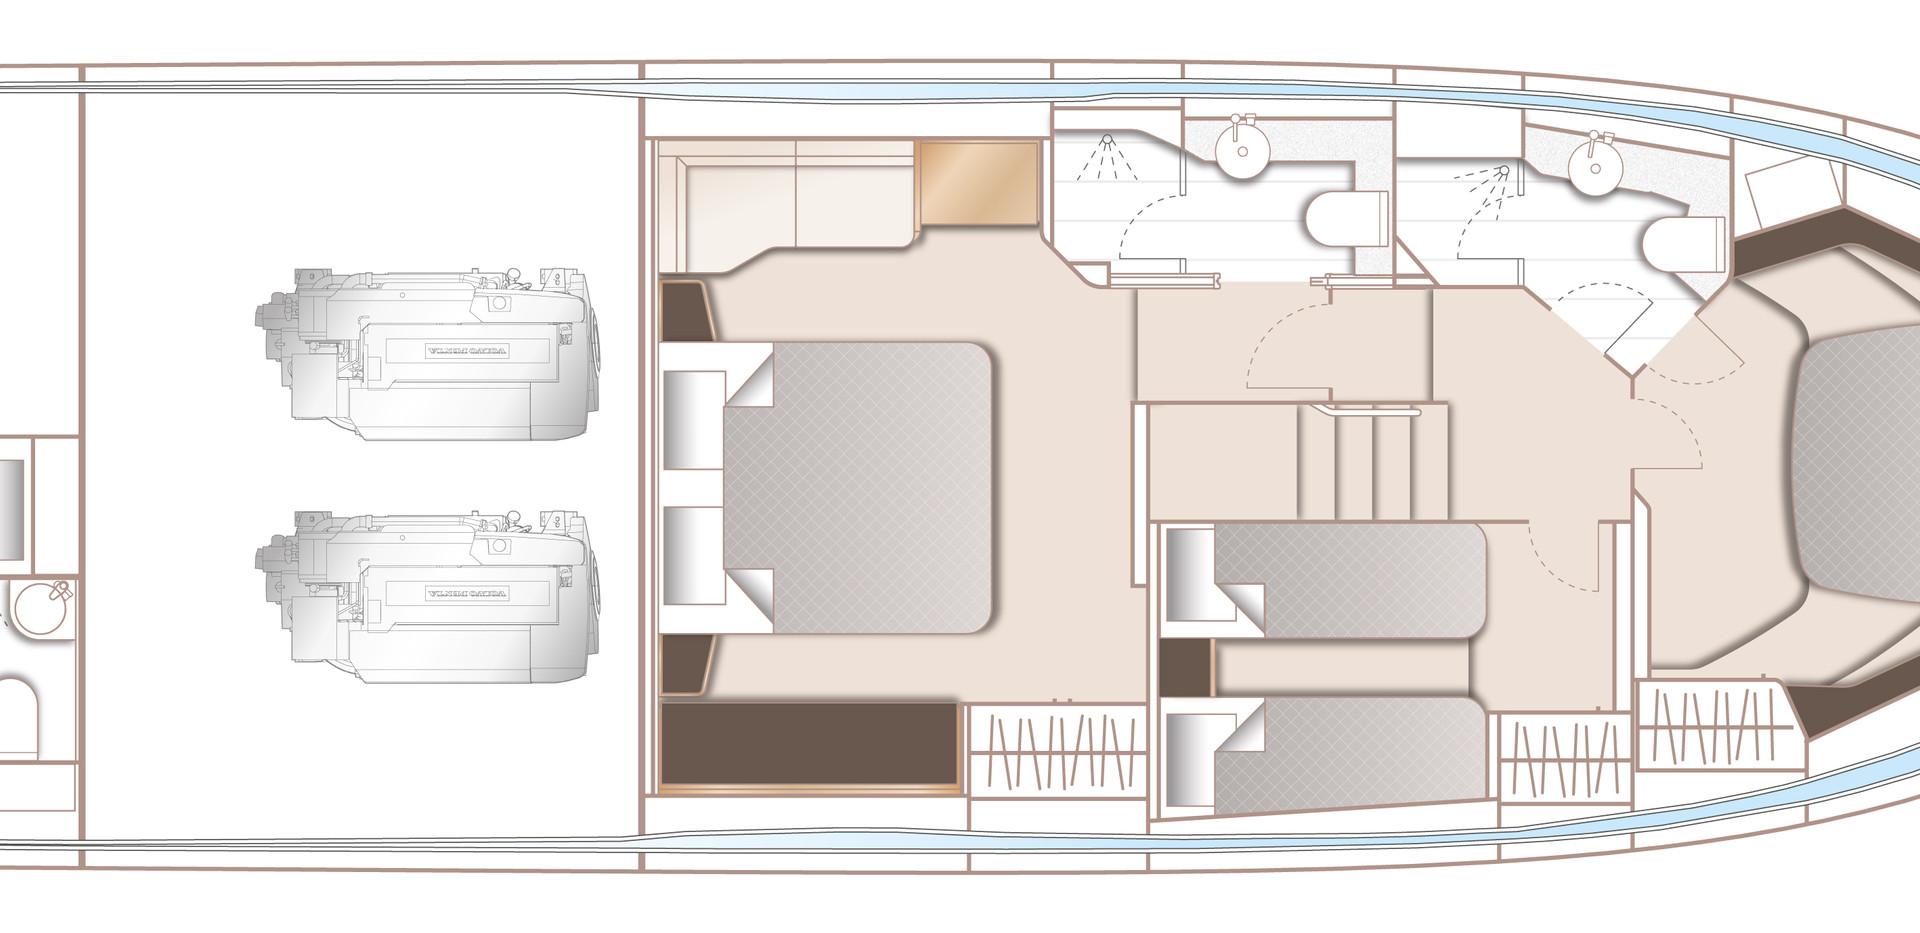 s62-layout-lower-deck.jpg